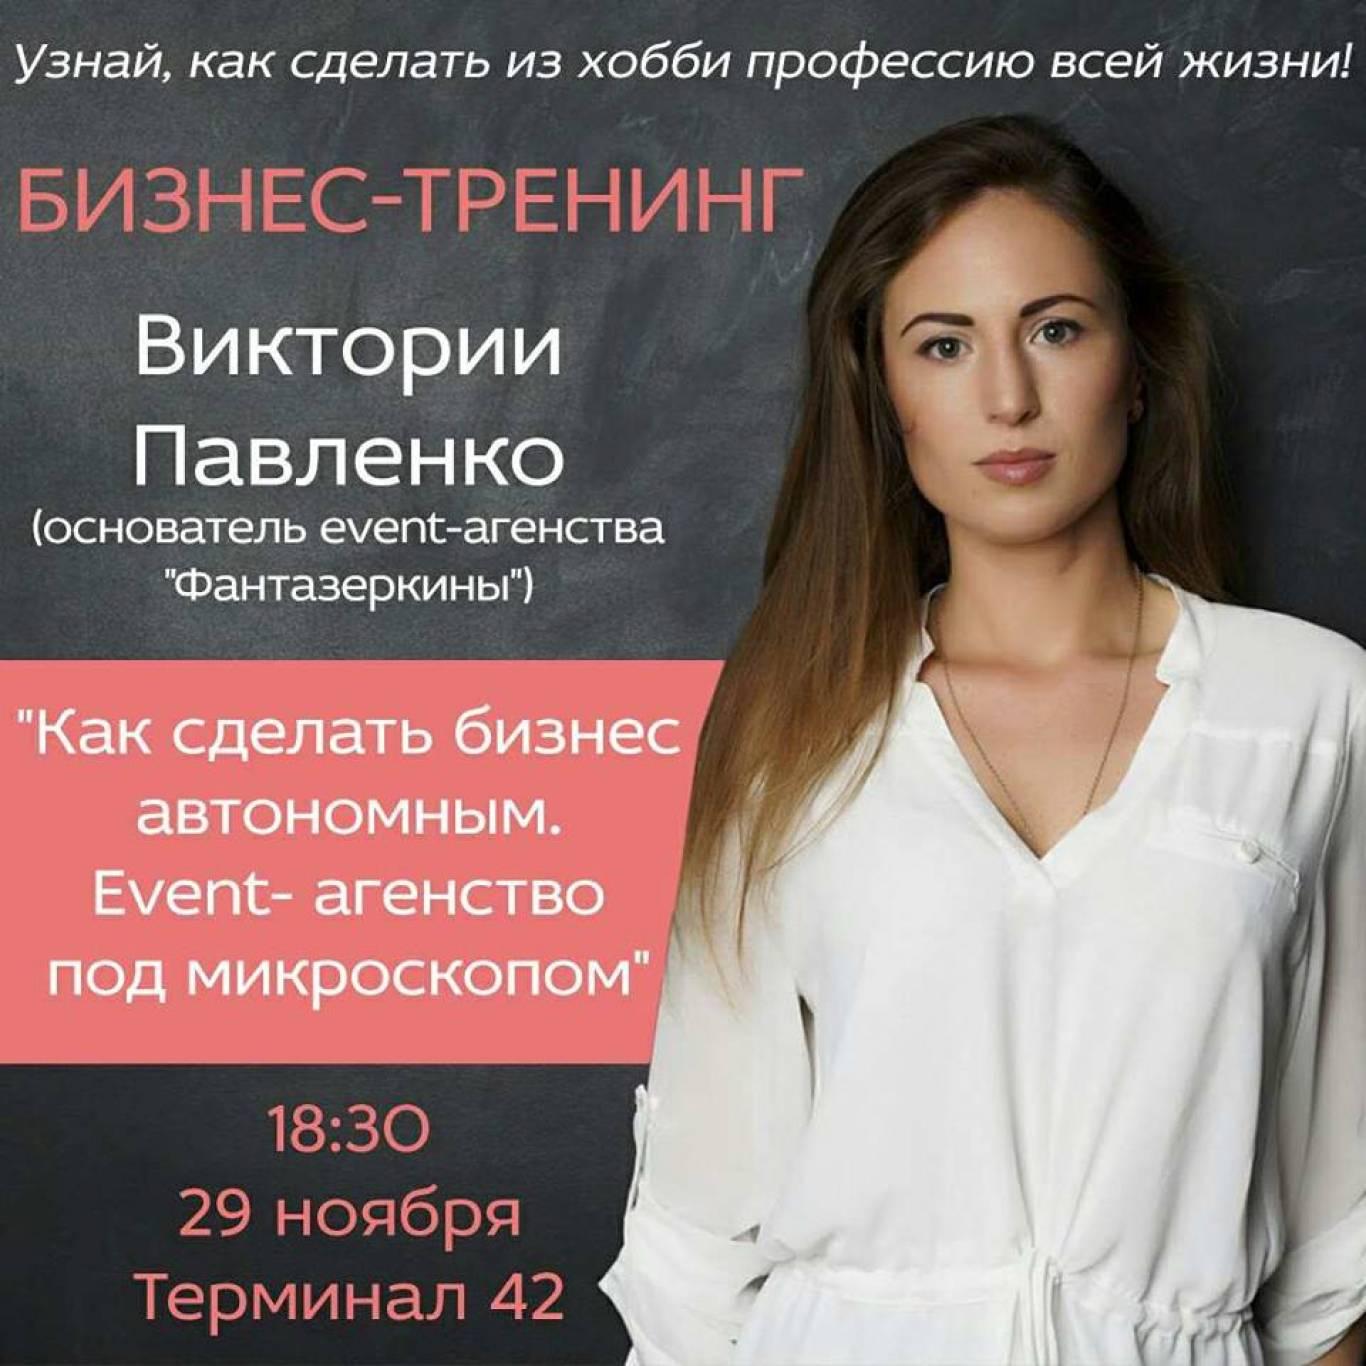 Бизнес-тренинг Виктории Павленко